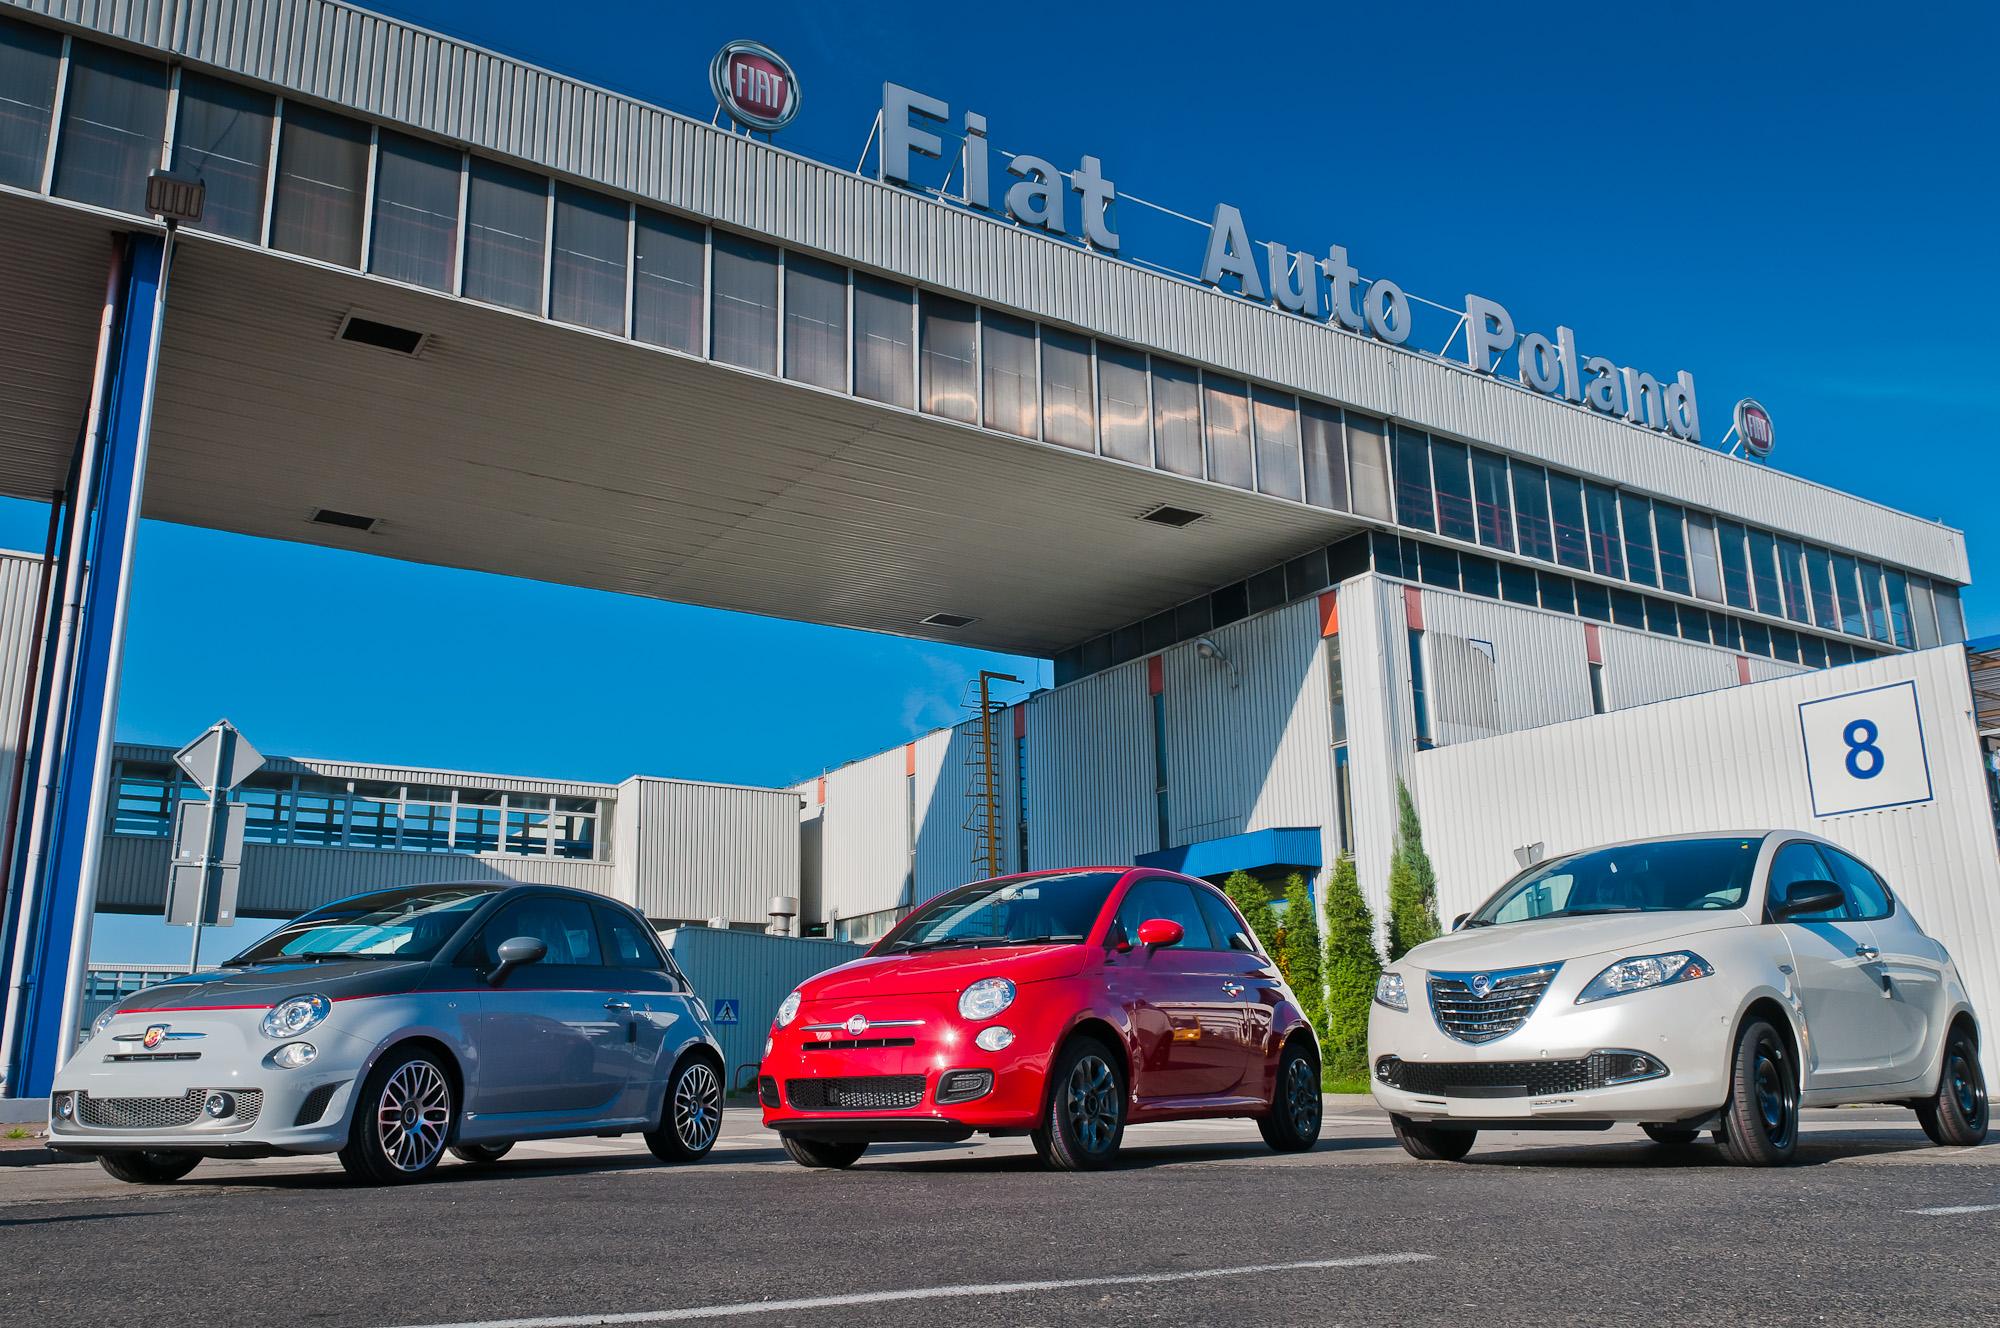 FIAT ABARTH_FIAT 500_LANCIA YPSILON_FAP TYCHY